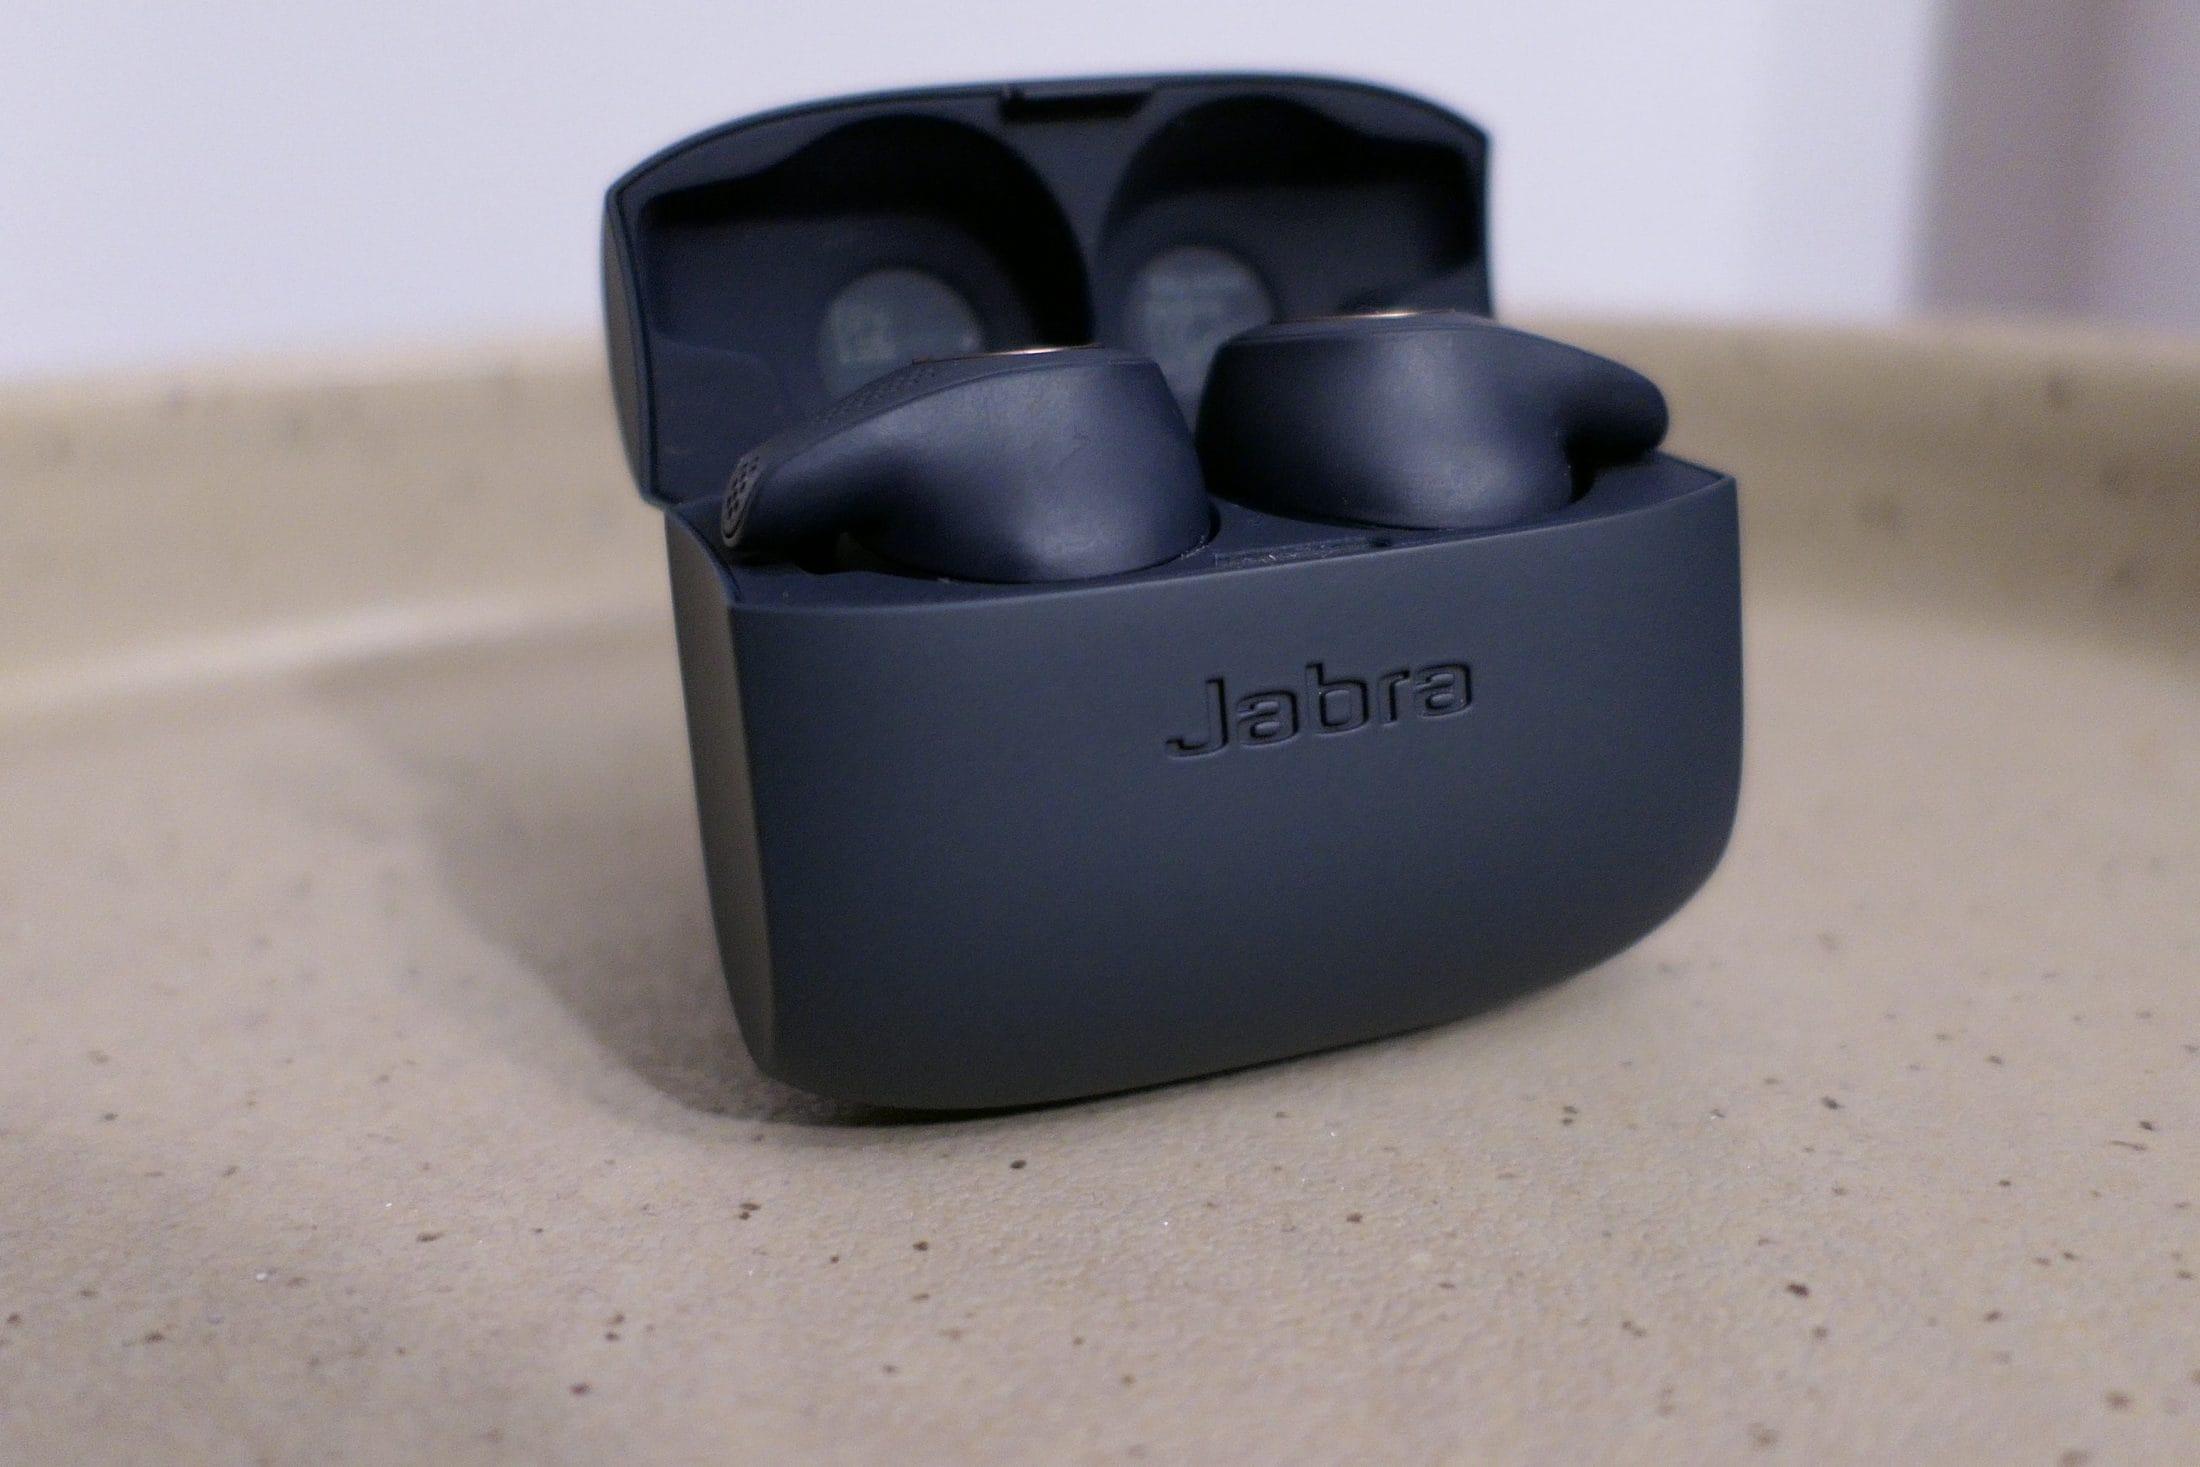 Jabra Elite Active 65t oppbevaringsboks